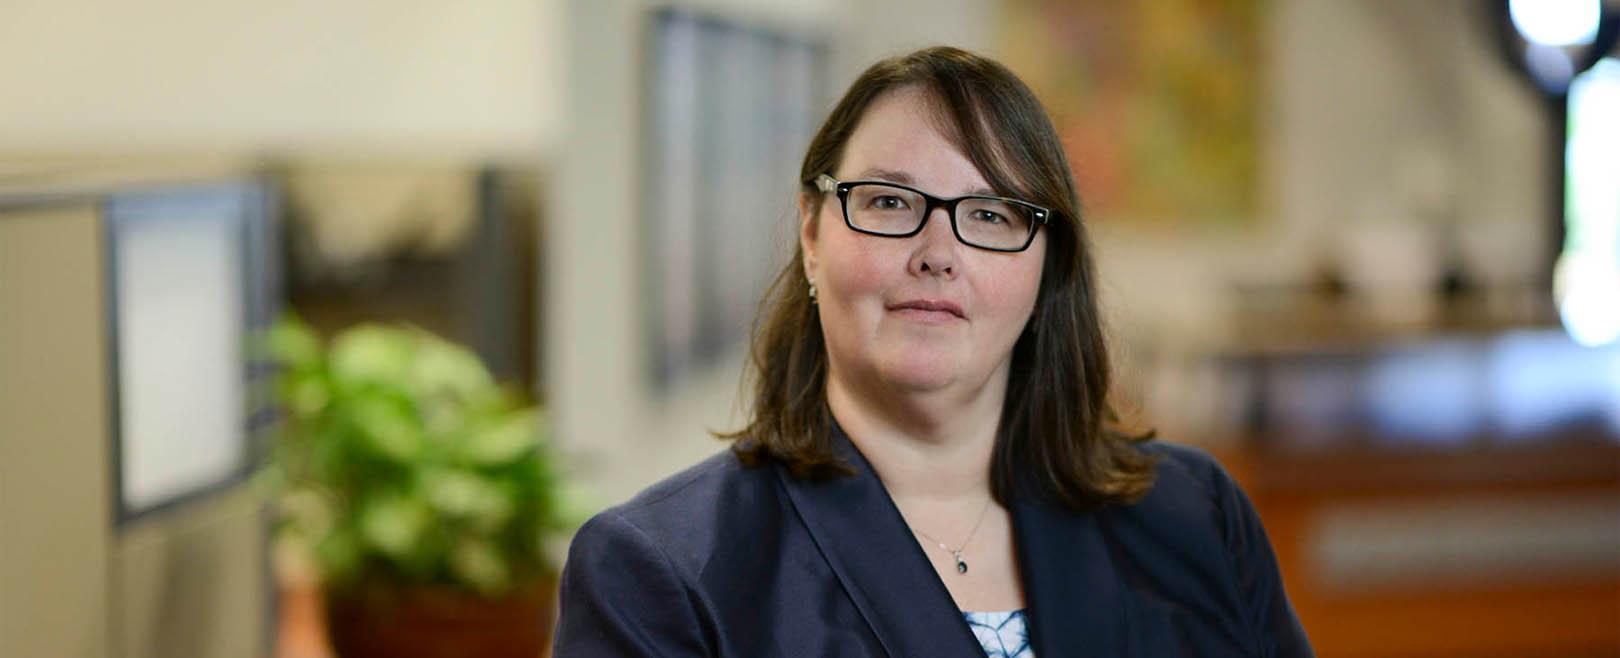 Trina Brown, Financial Advisor in Pittsburgh